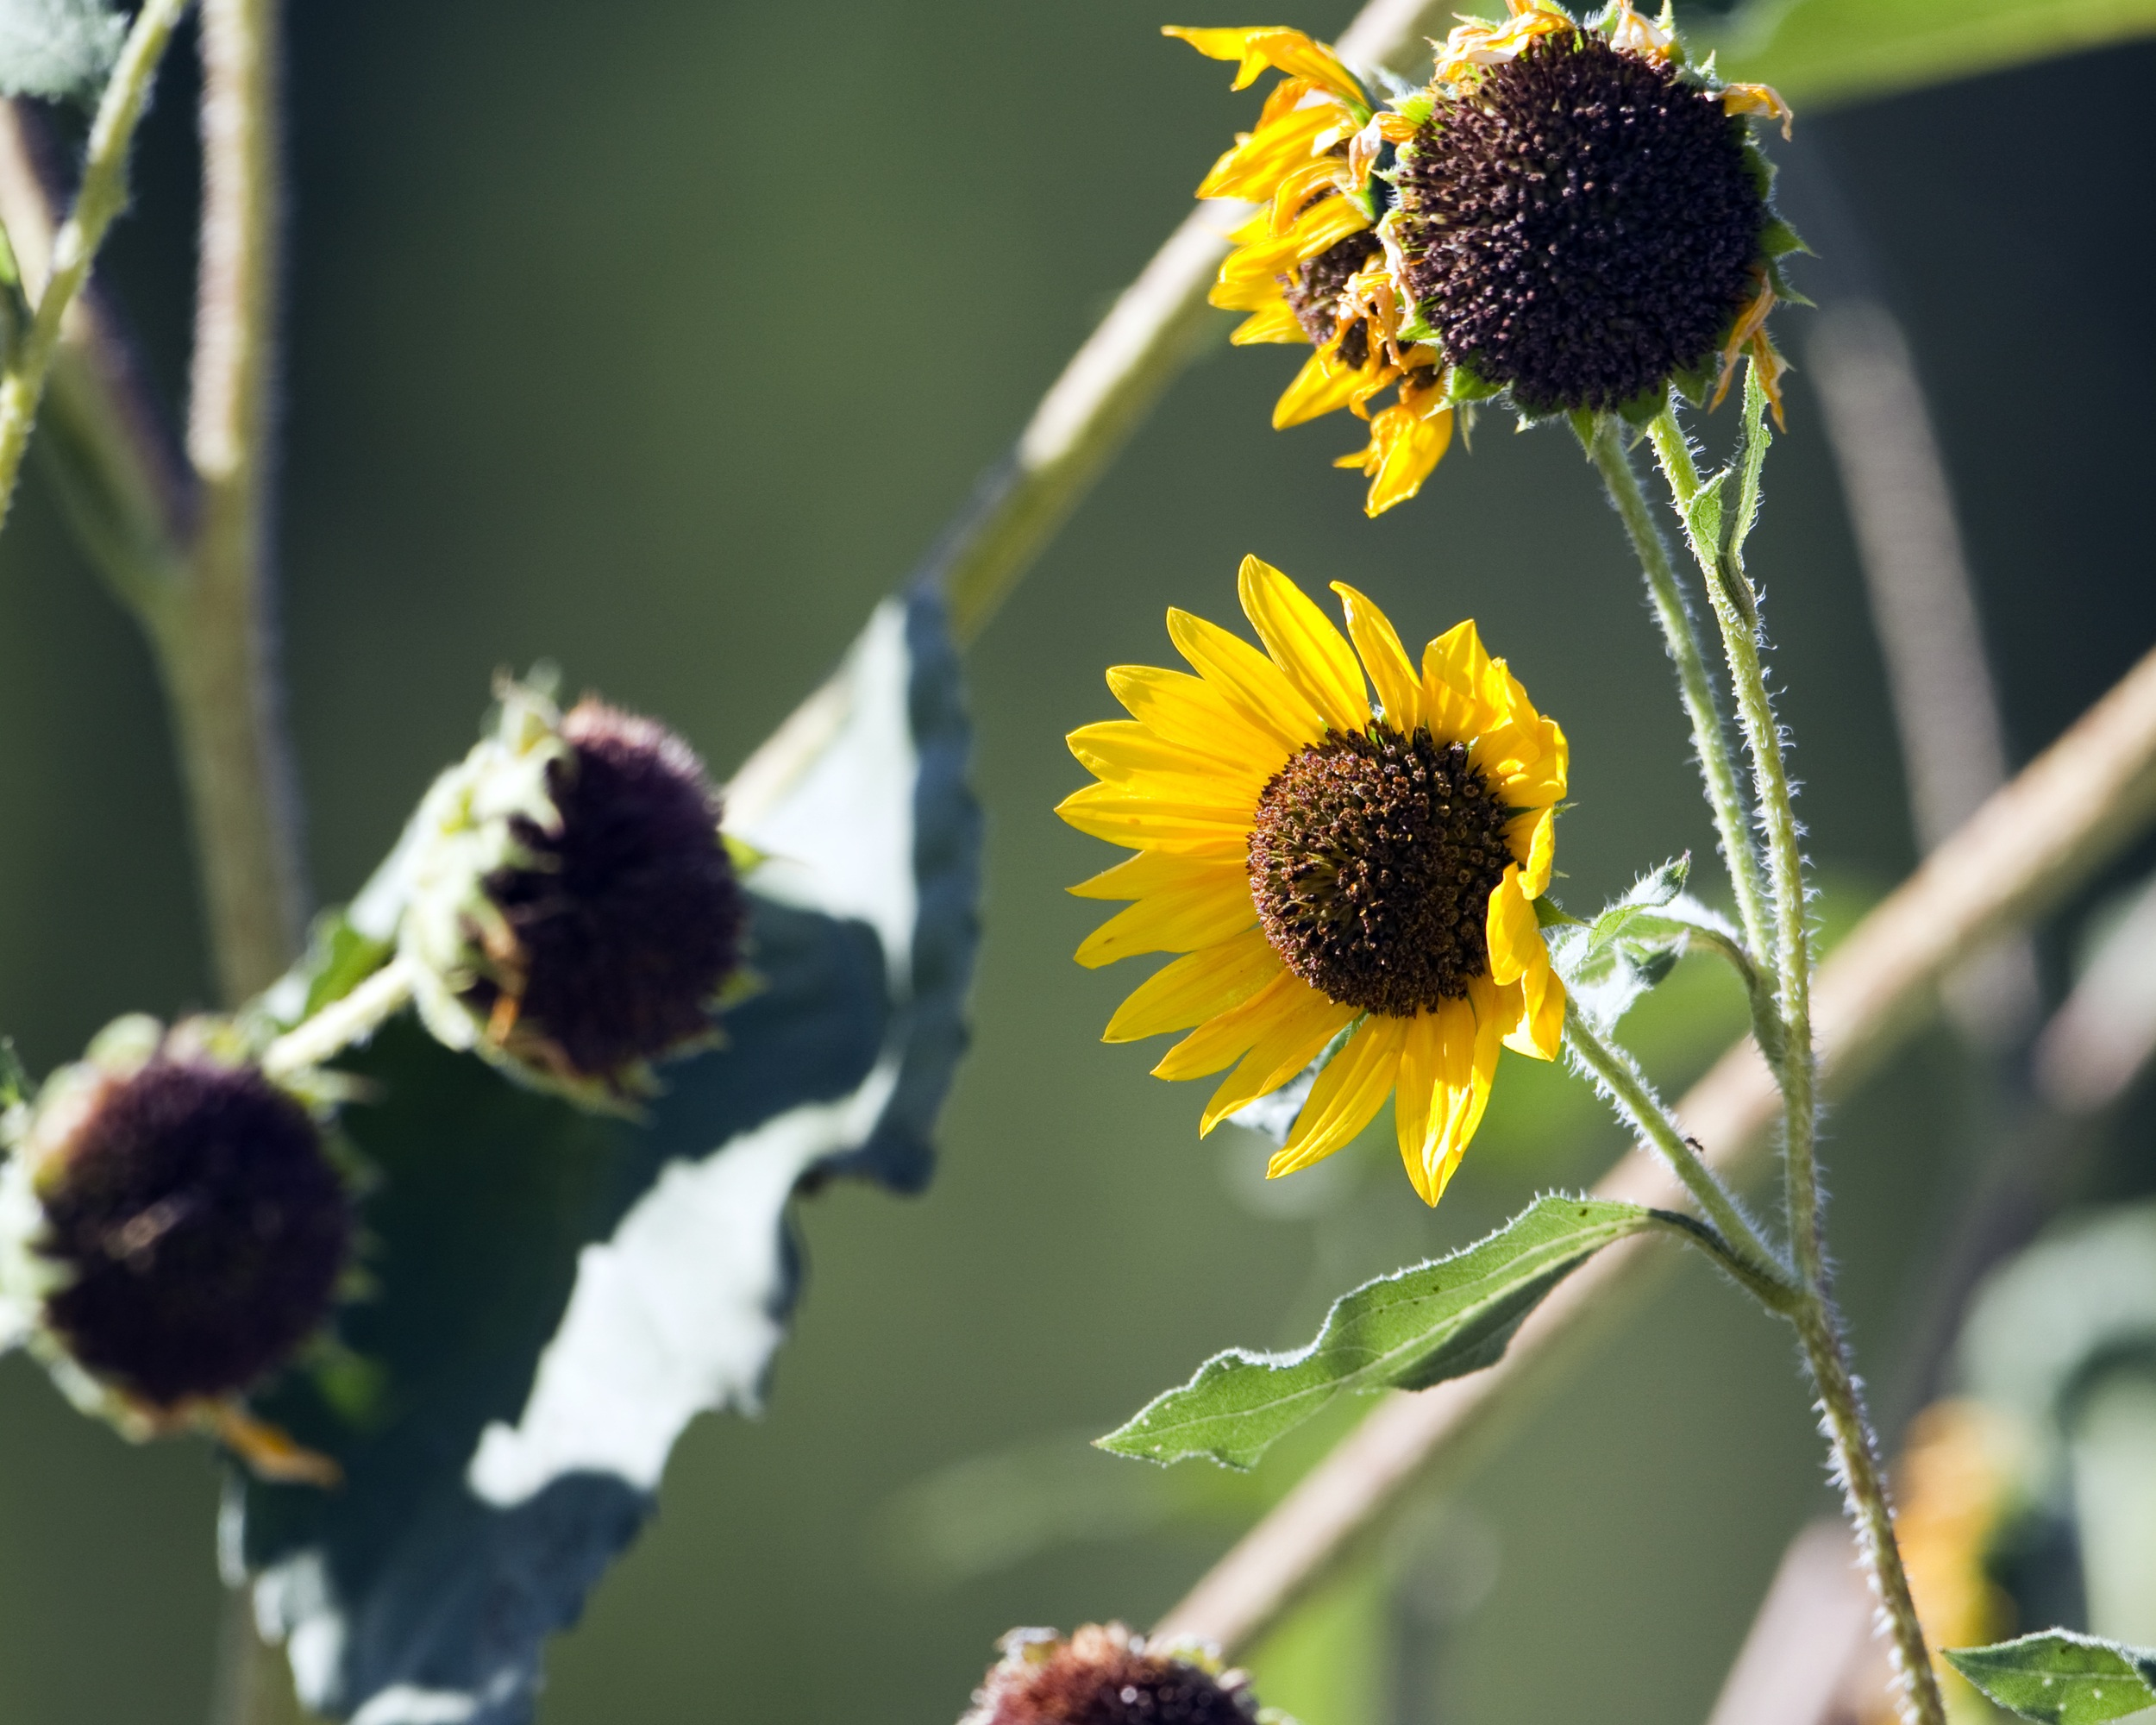 Annual sunflower (Helianthus annuus) (2).jpg